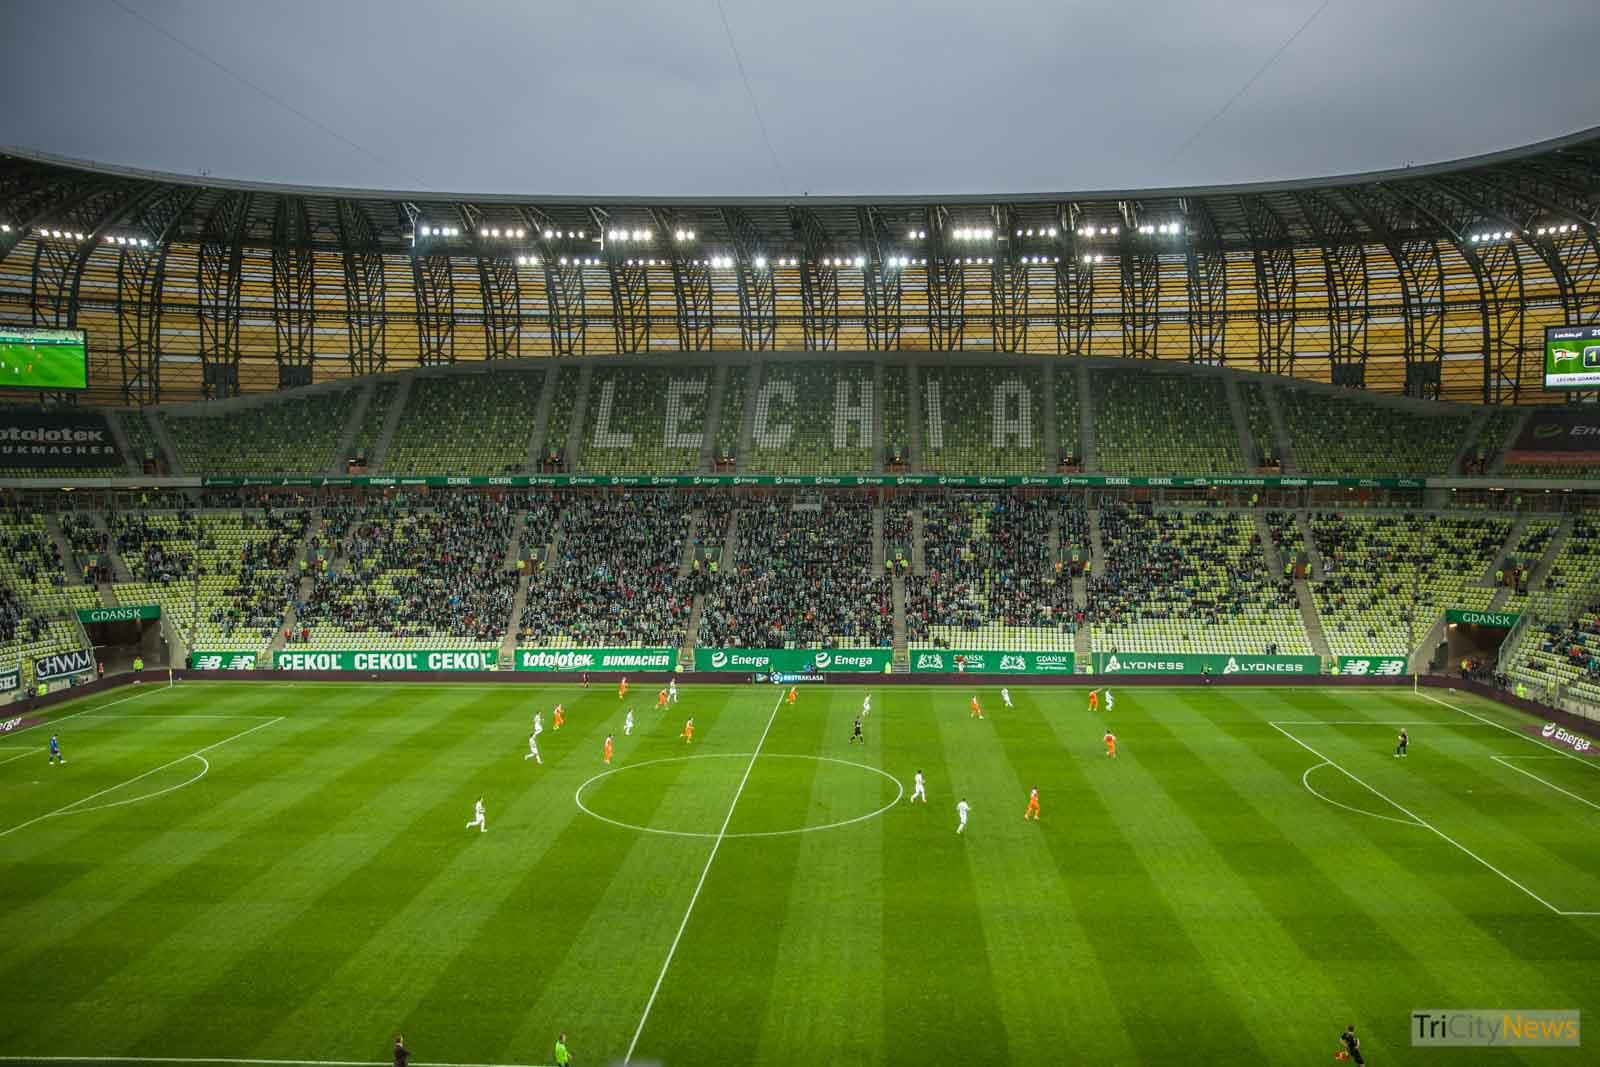 Lechia Gdansk back to winning ways at the Energa - TriCityNews